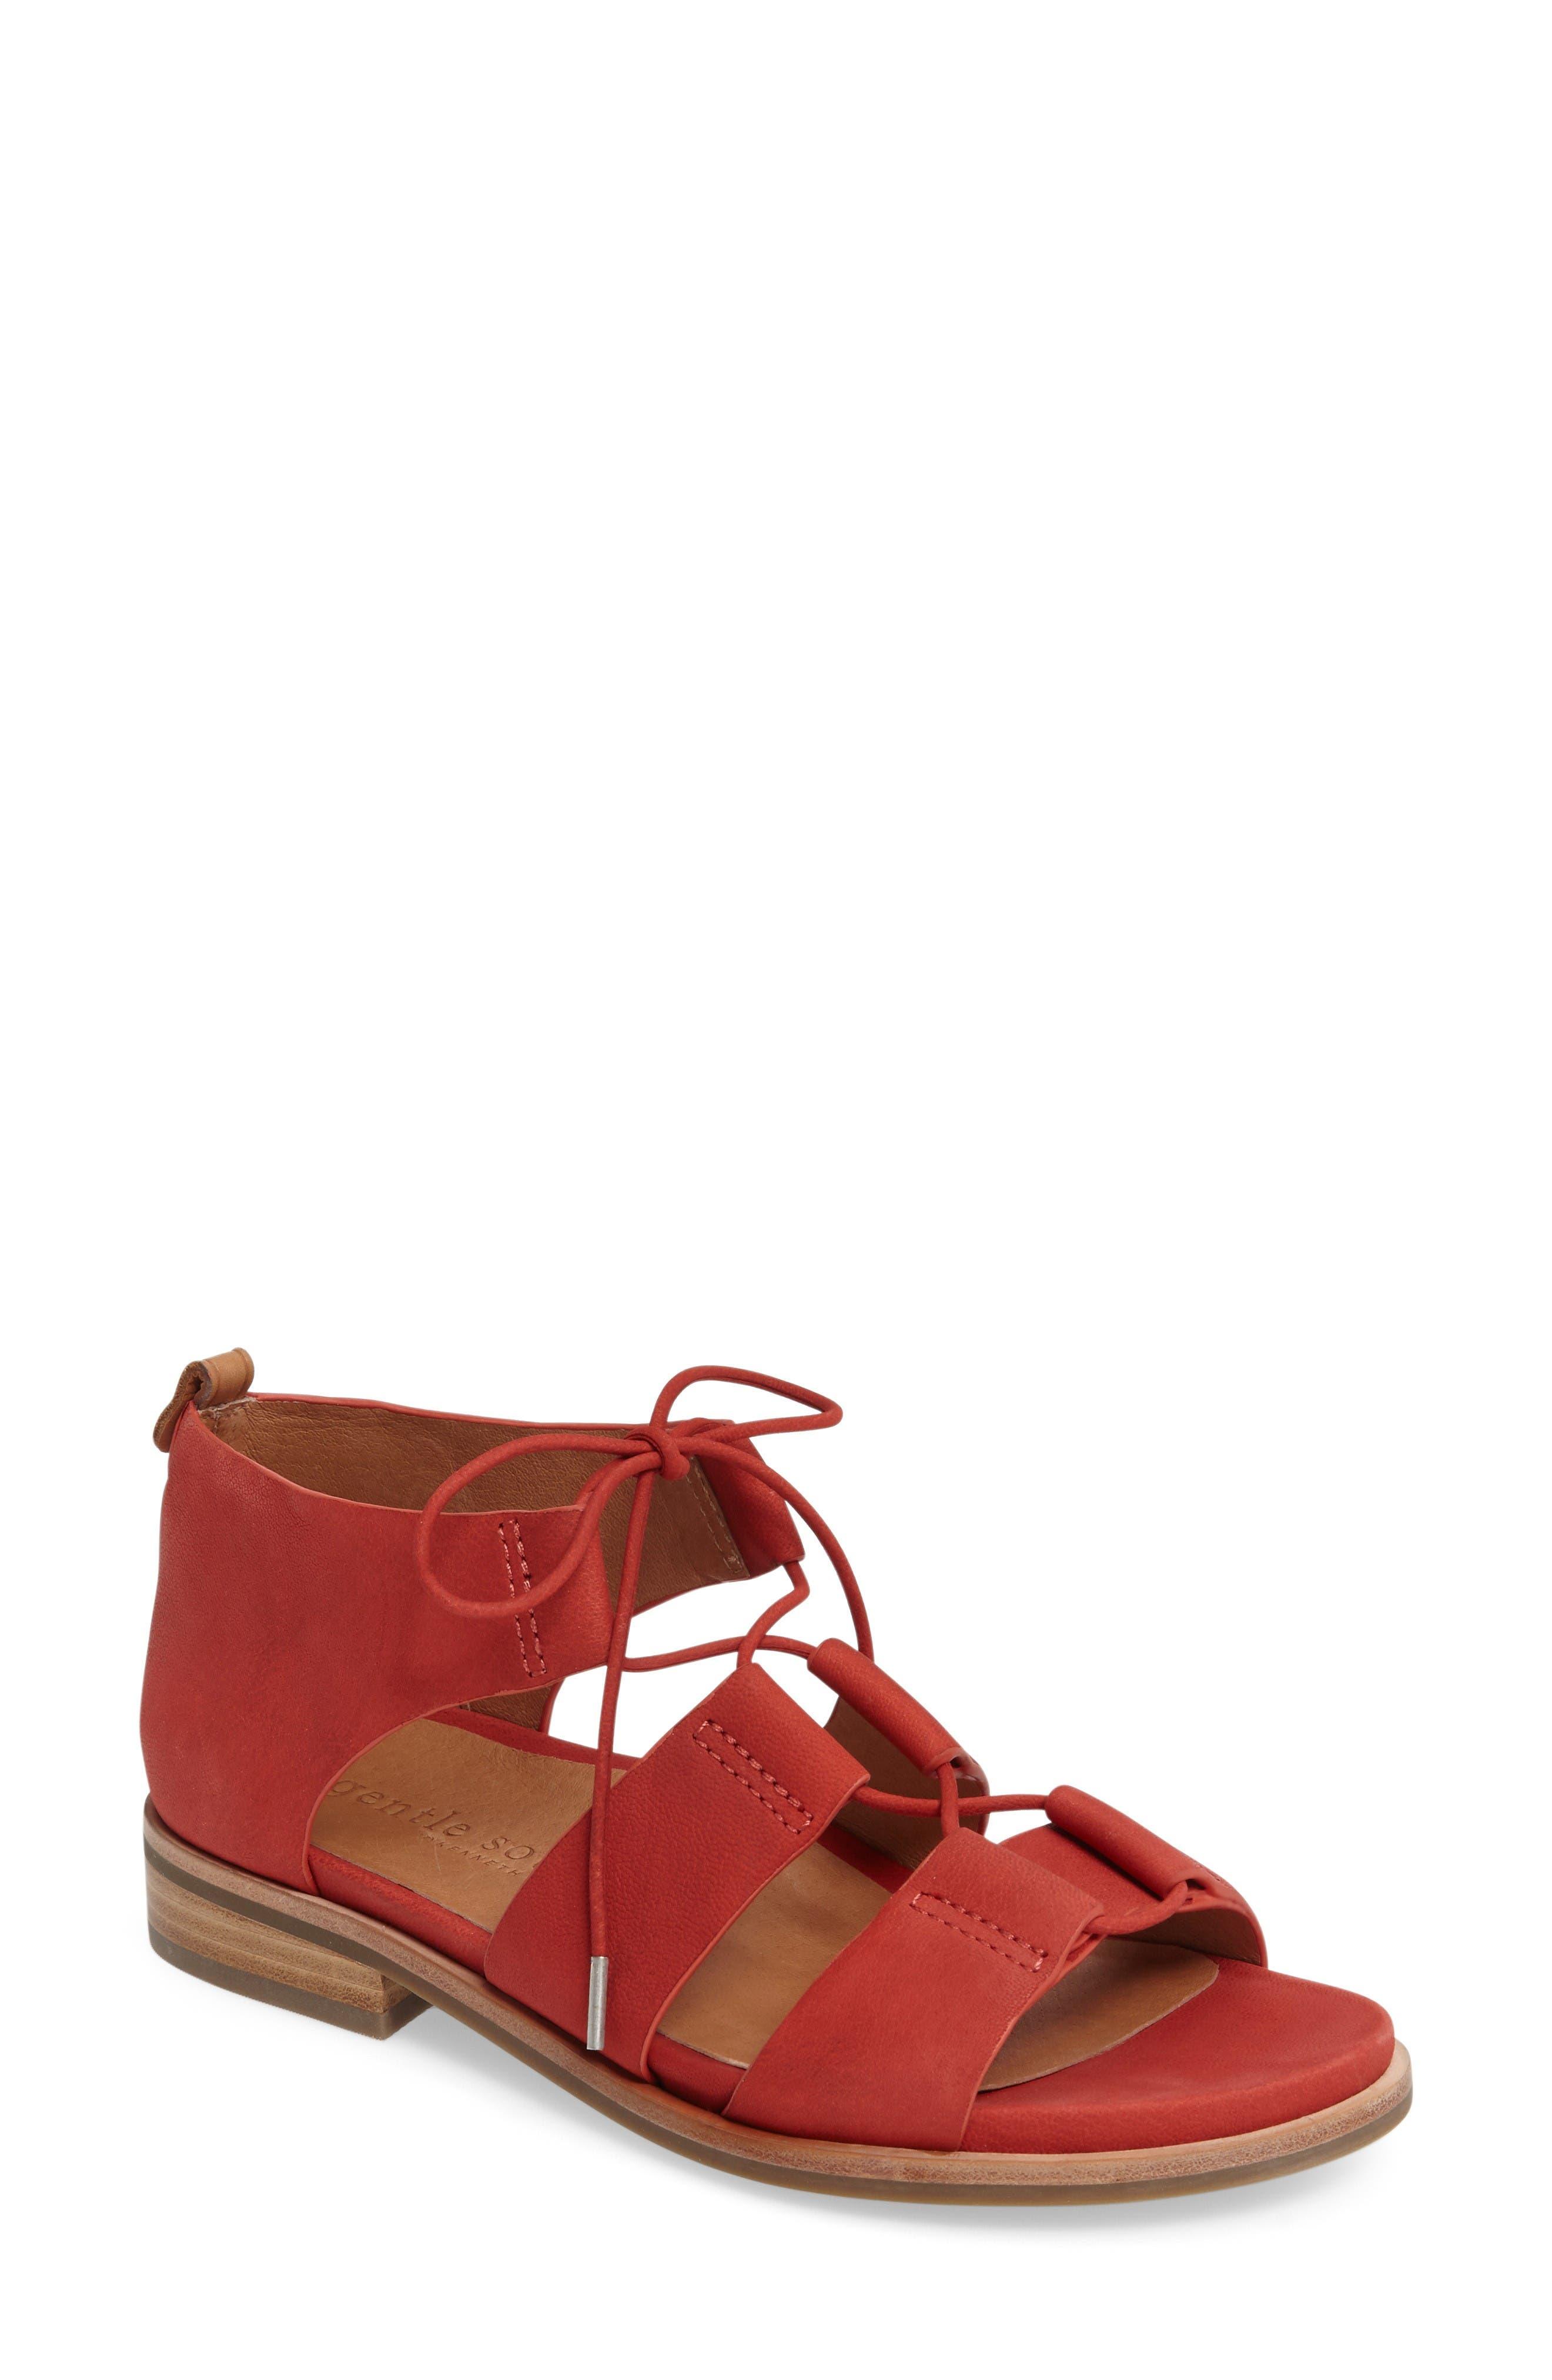 GENTLE SOULS Fina Lace-Up Sandal